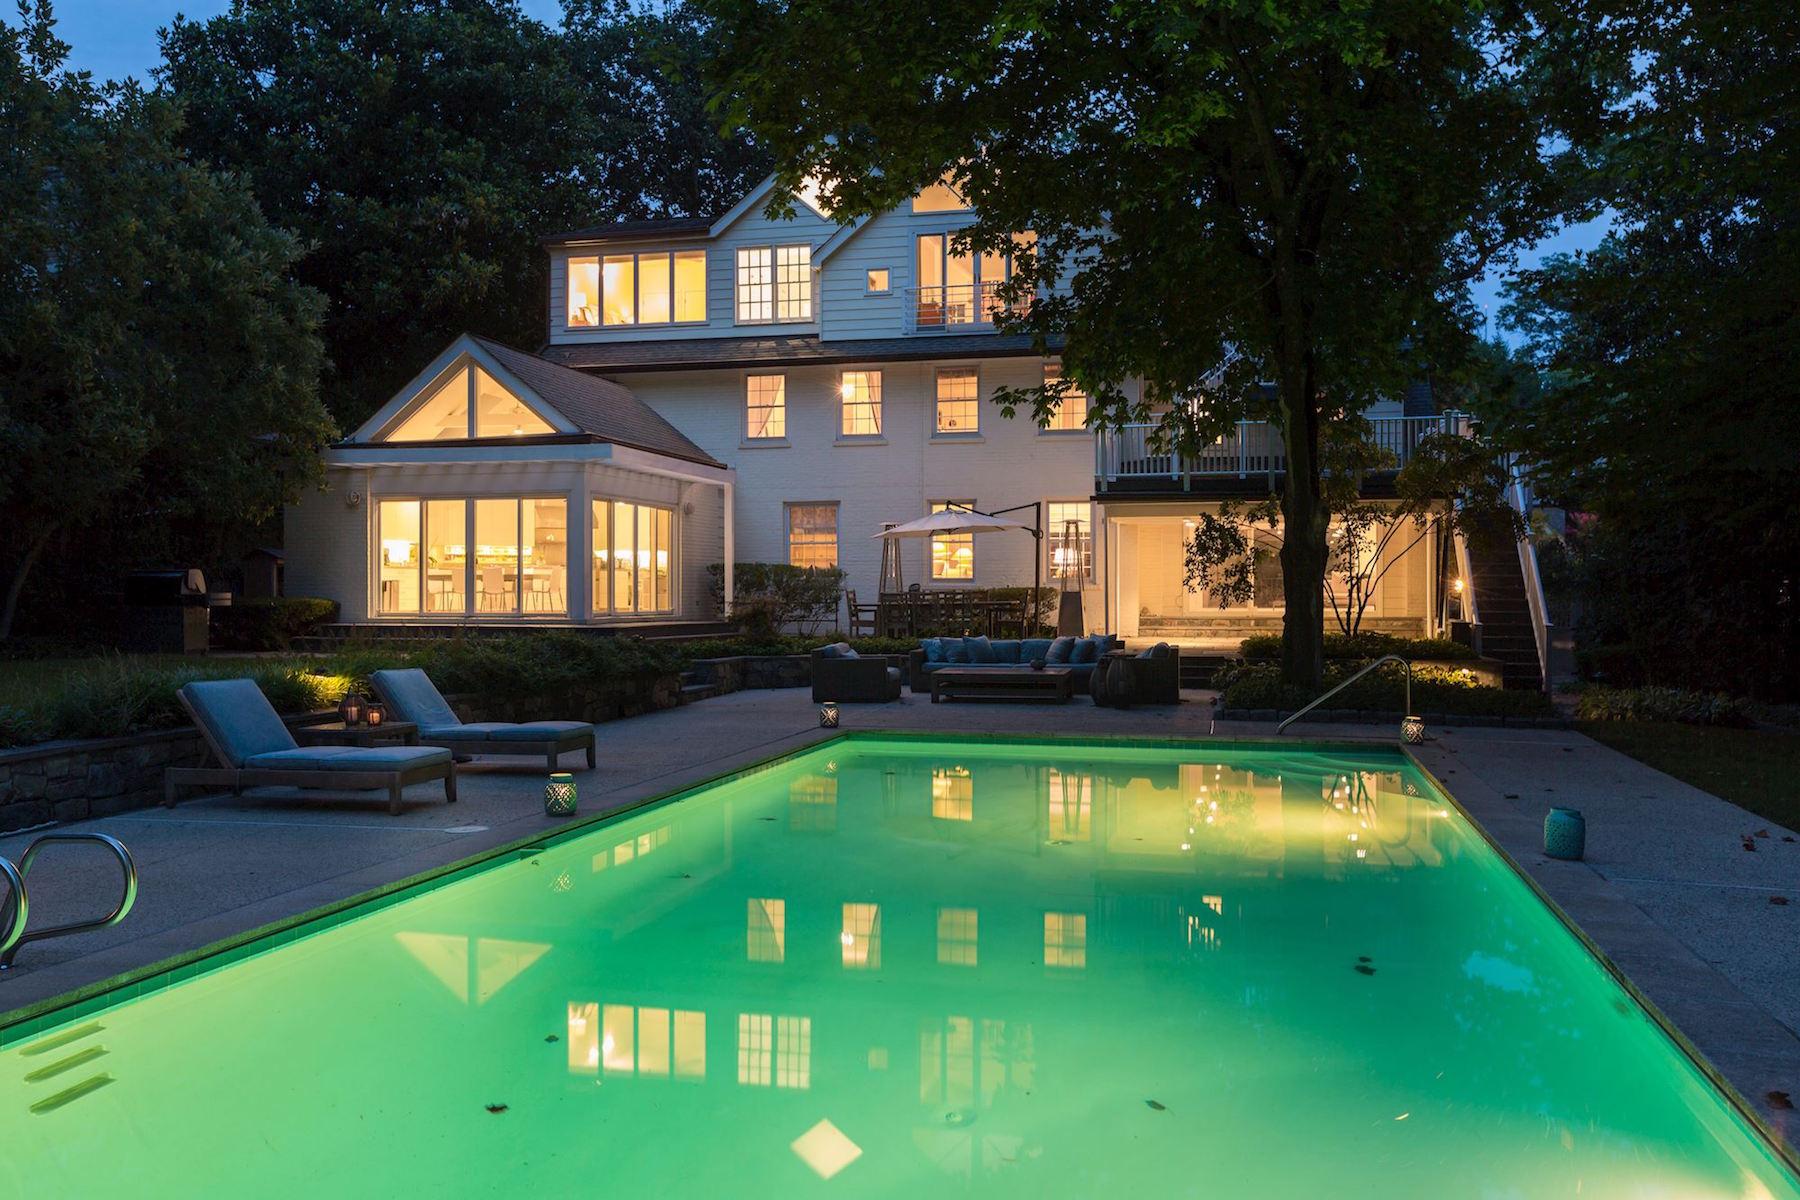 Additional photo for property listing at 5153 Tilden Street 5153 Tilden Street Nw Washington, District De Columbia 20016 États-Unis